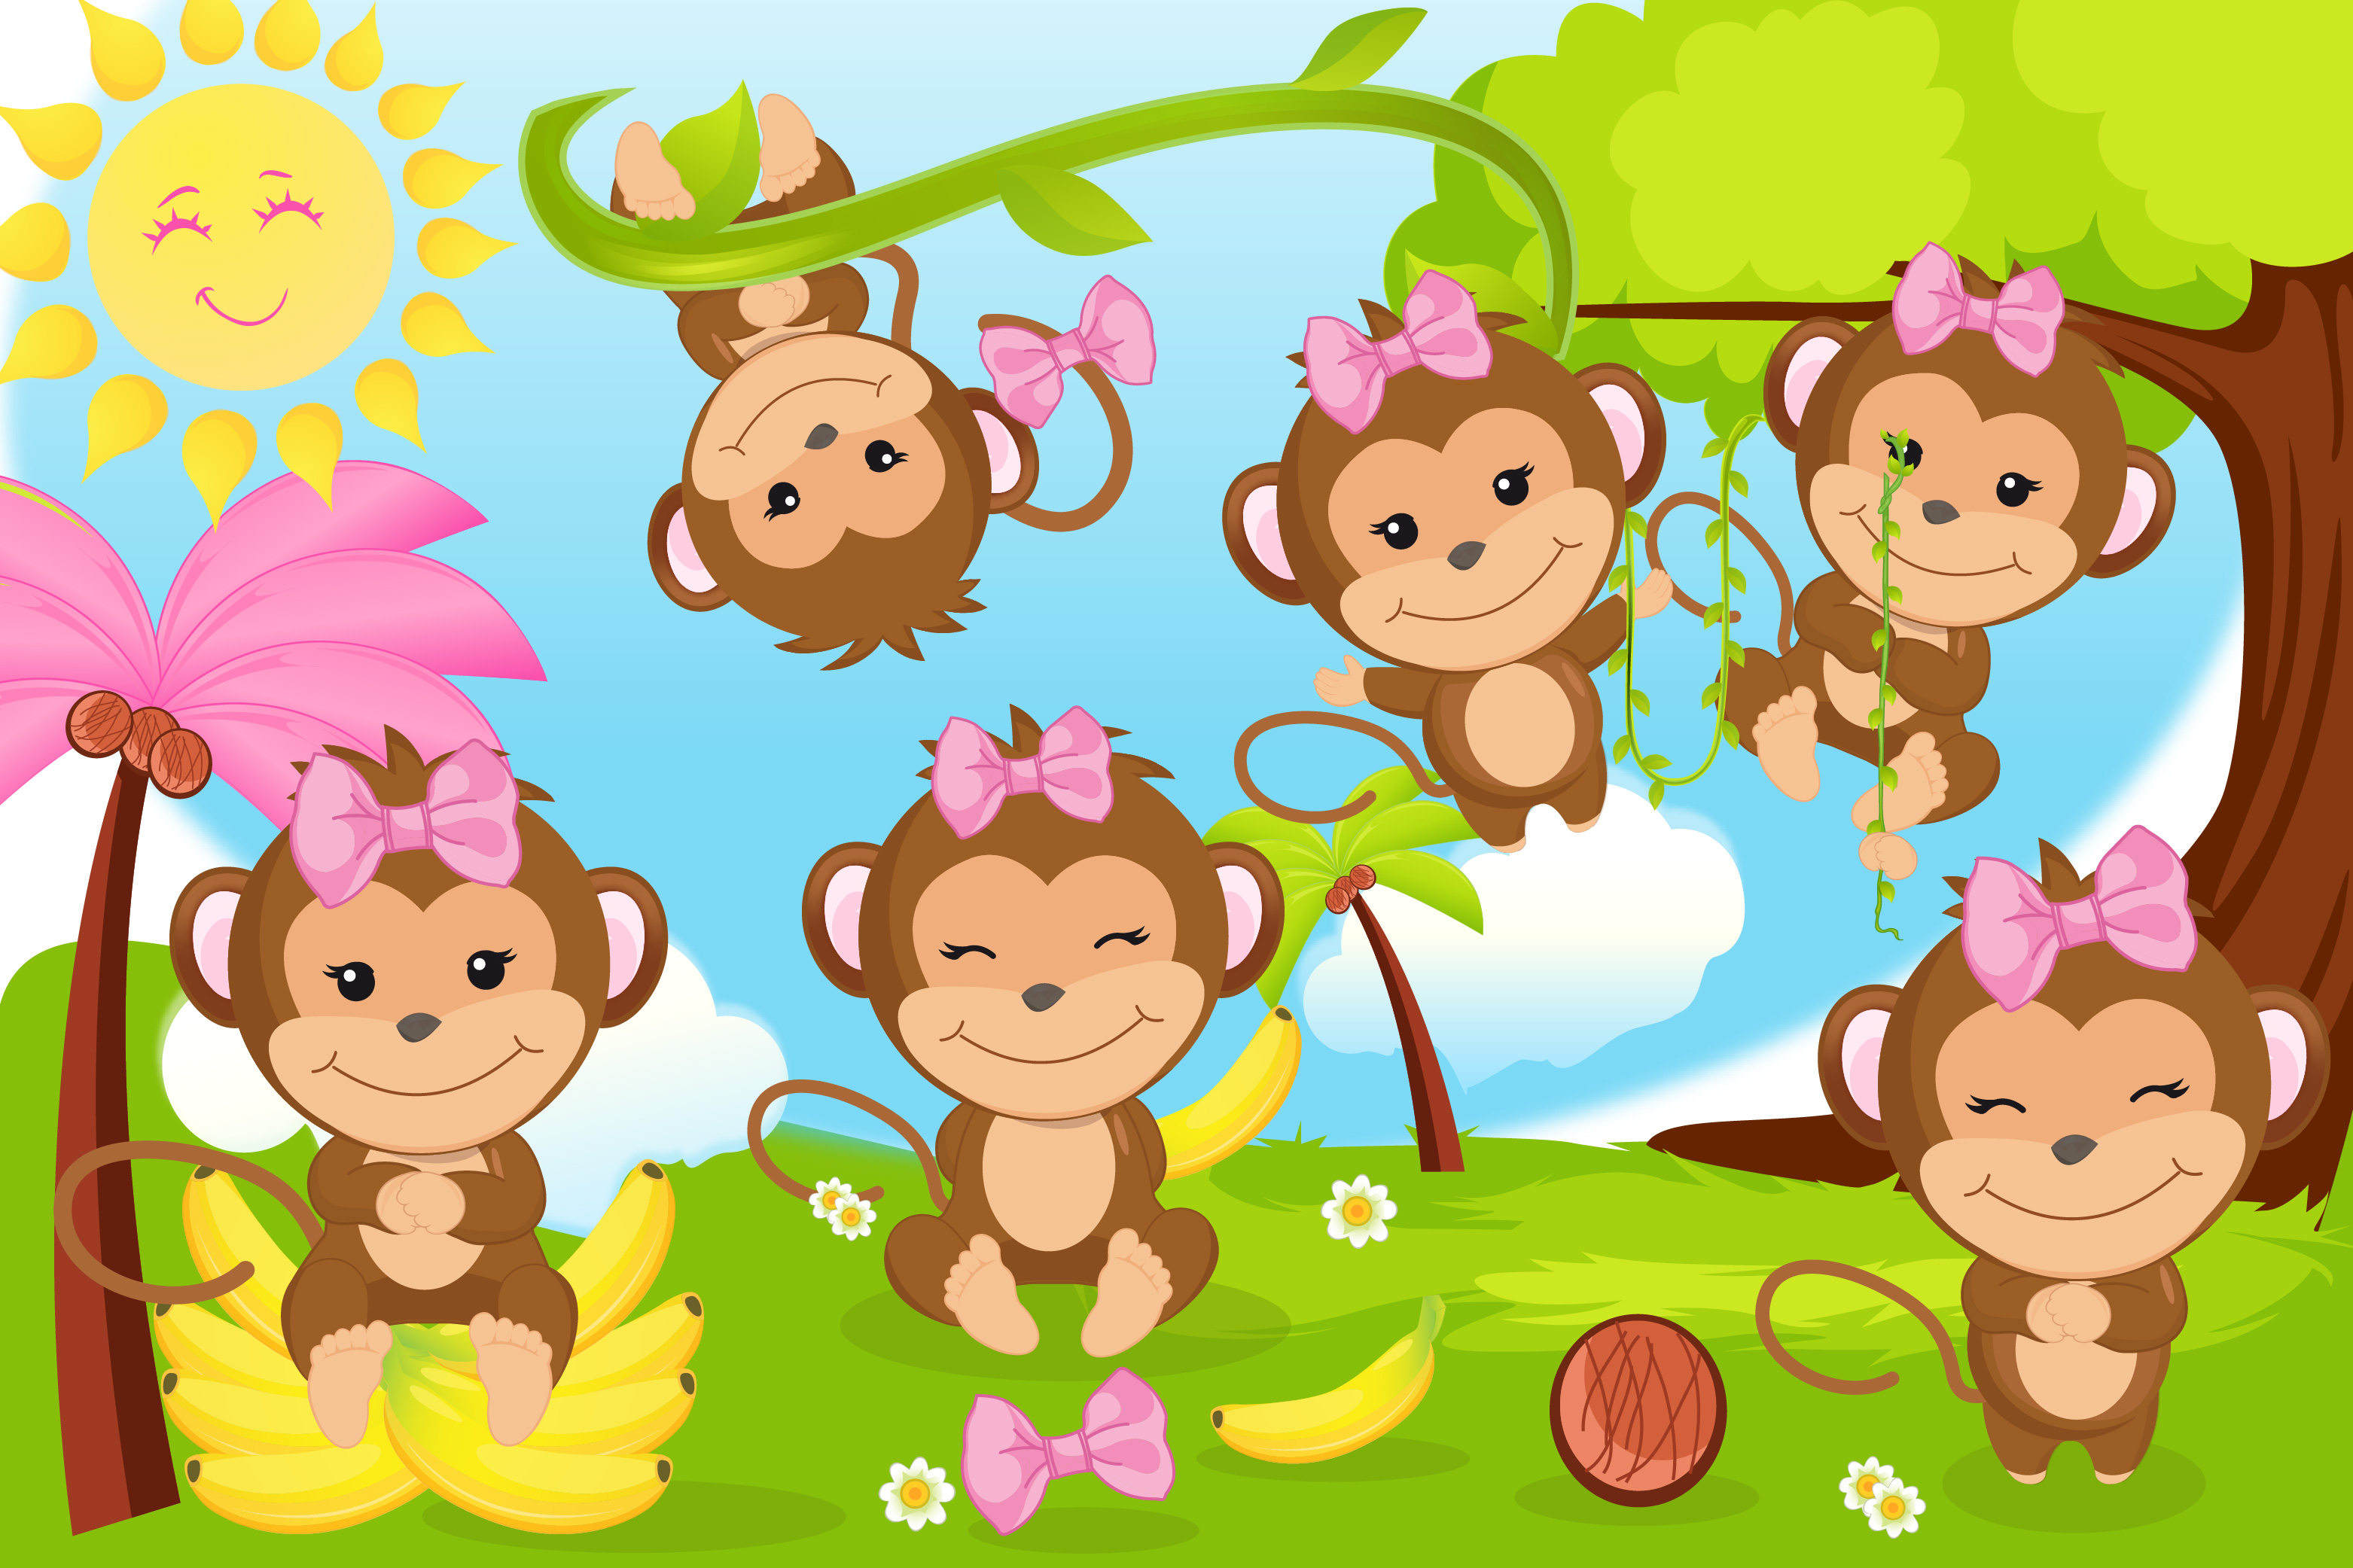 Monkey clipart, Monkey girl illustrations.